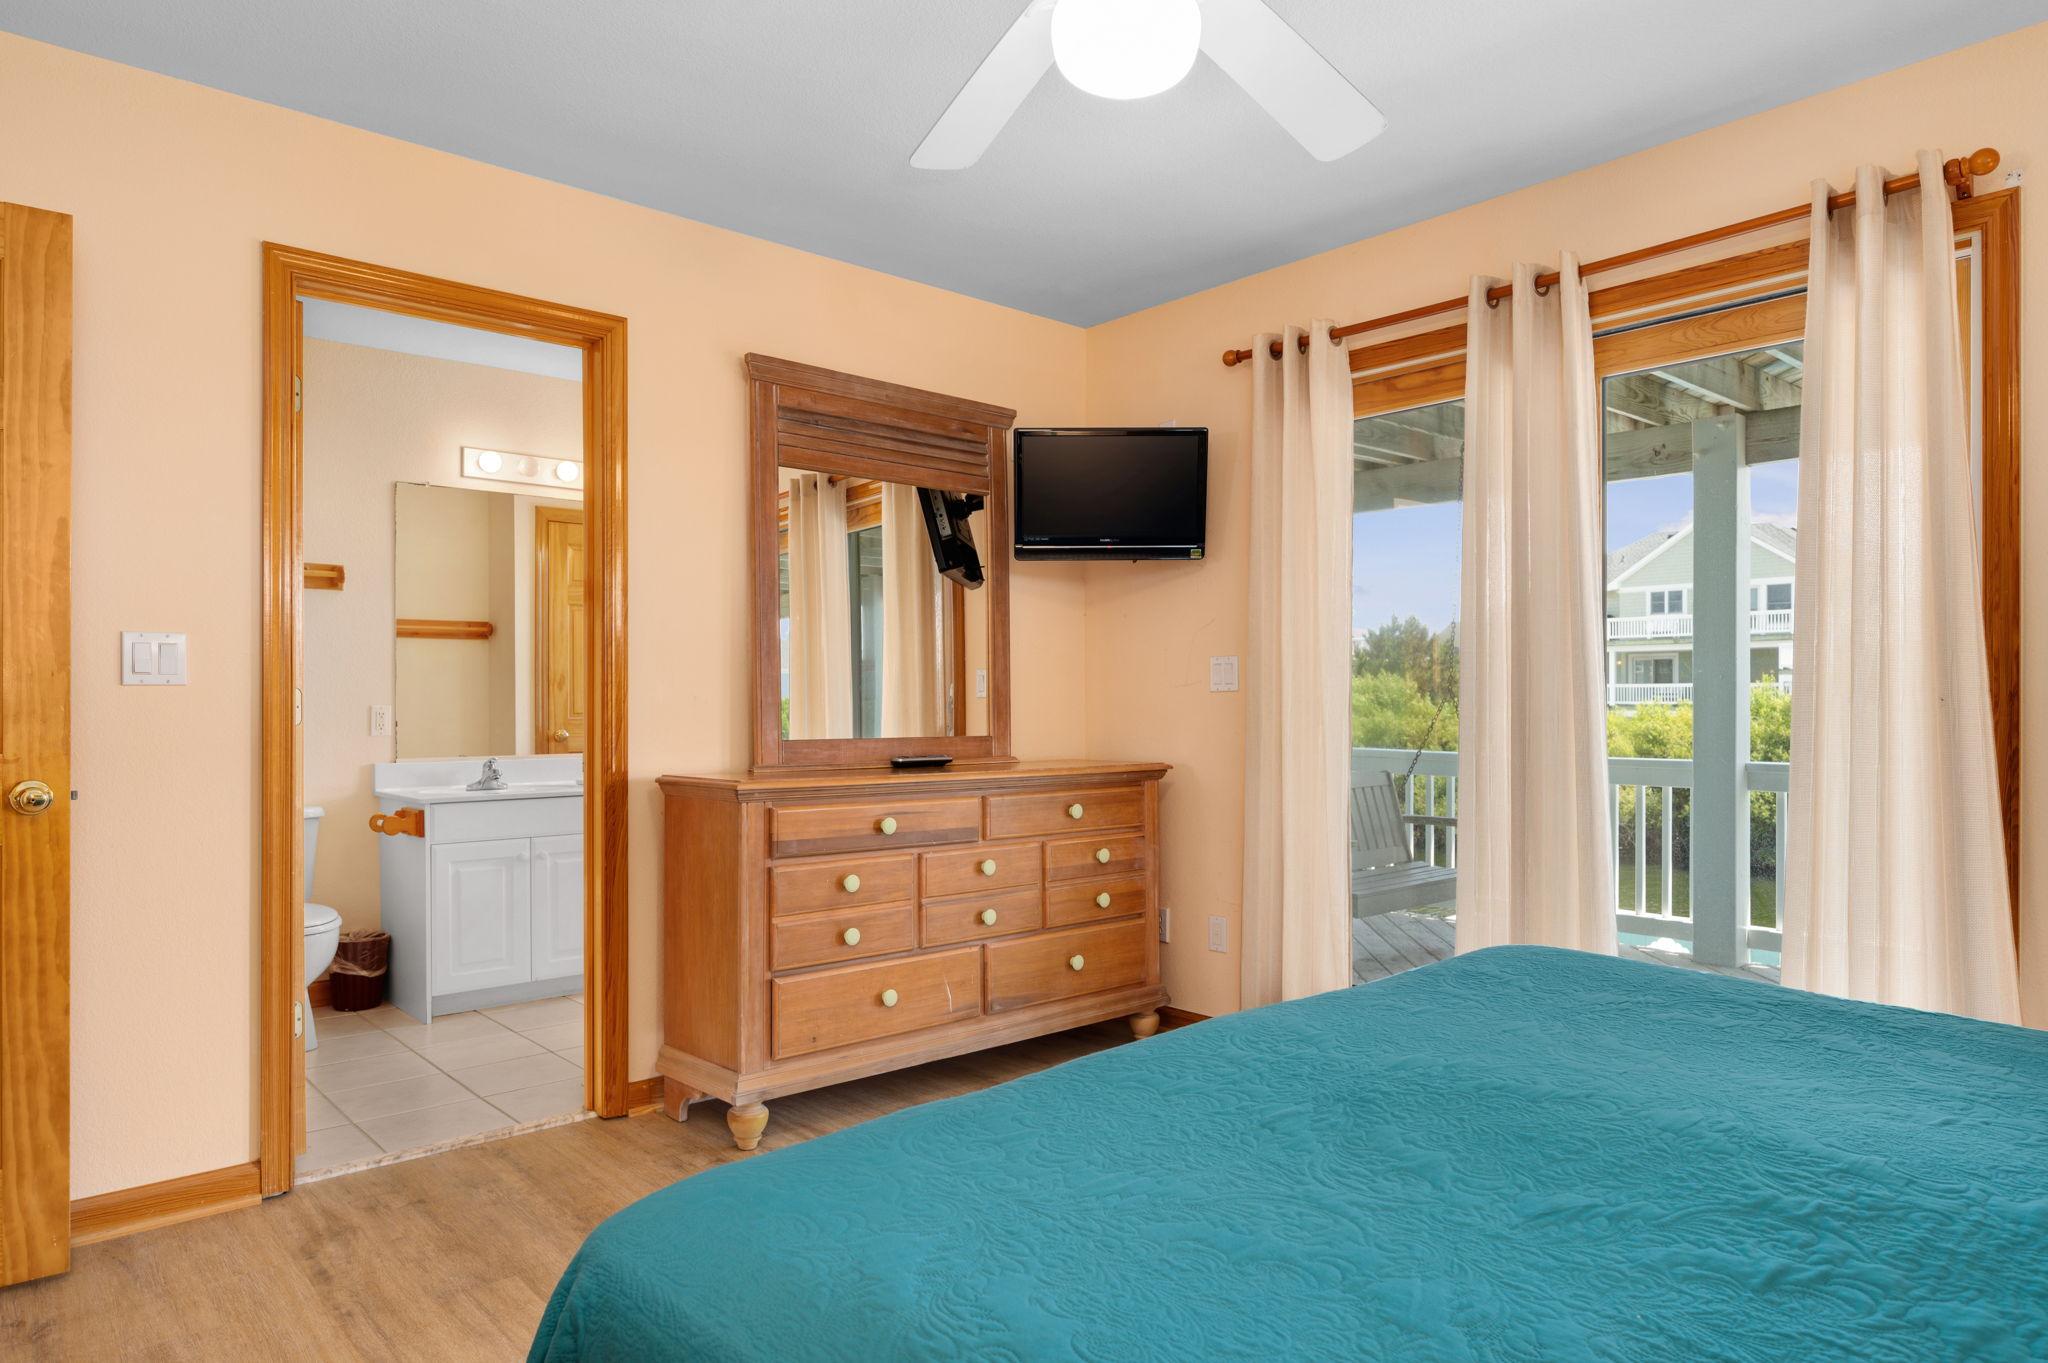 795 Mercury Road   Mid Level Bedroom 4